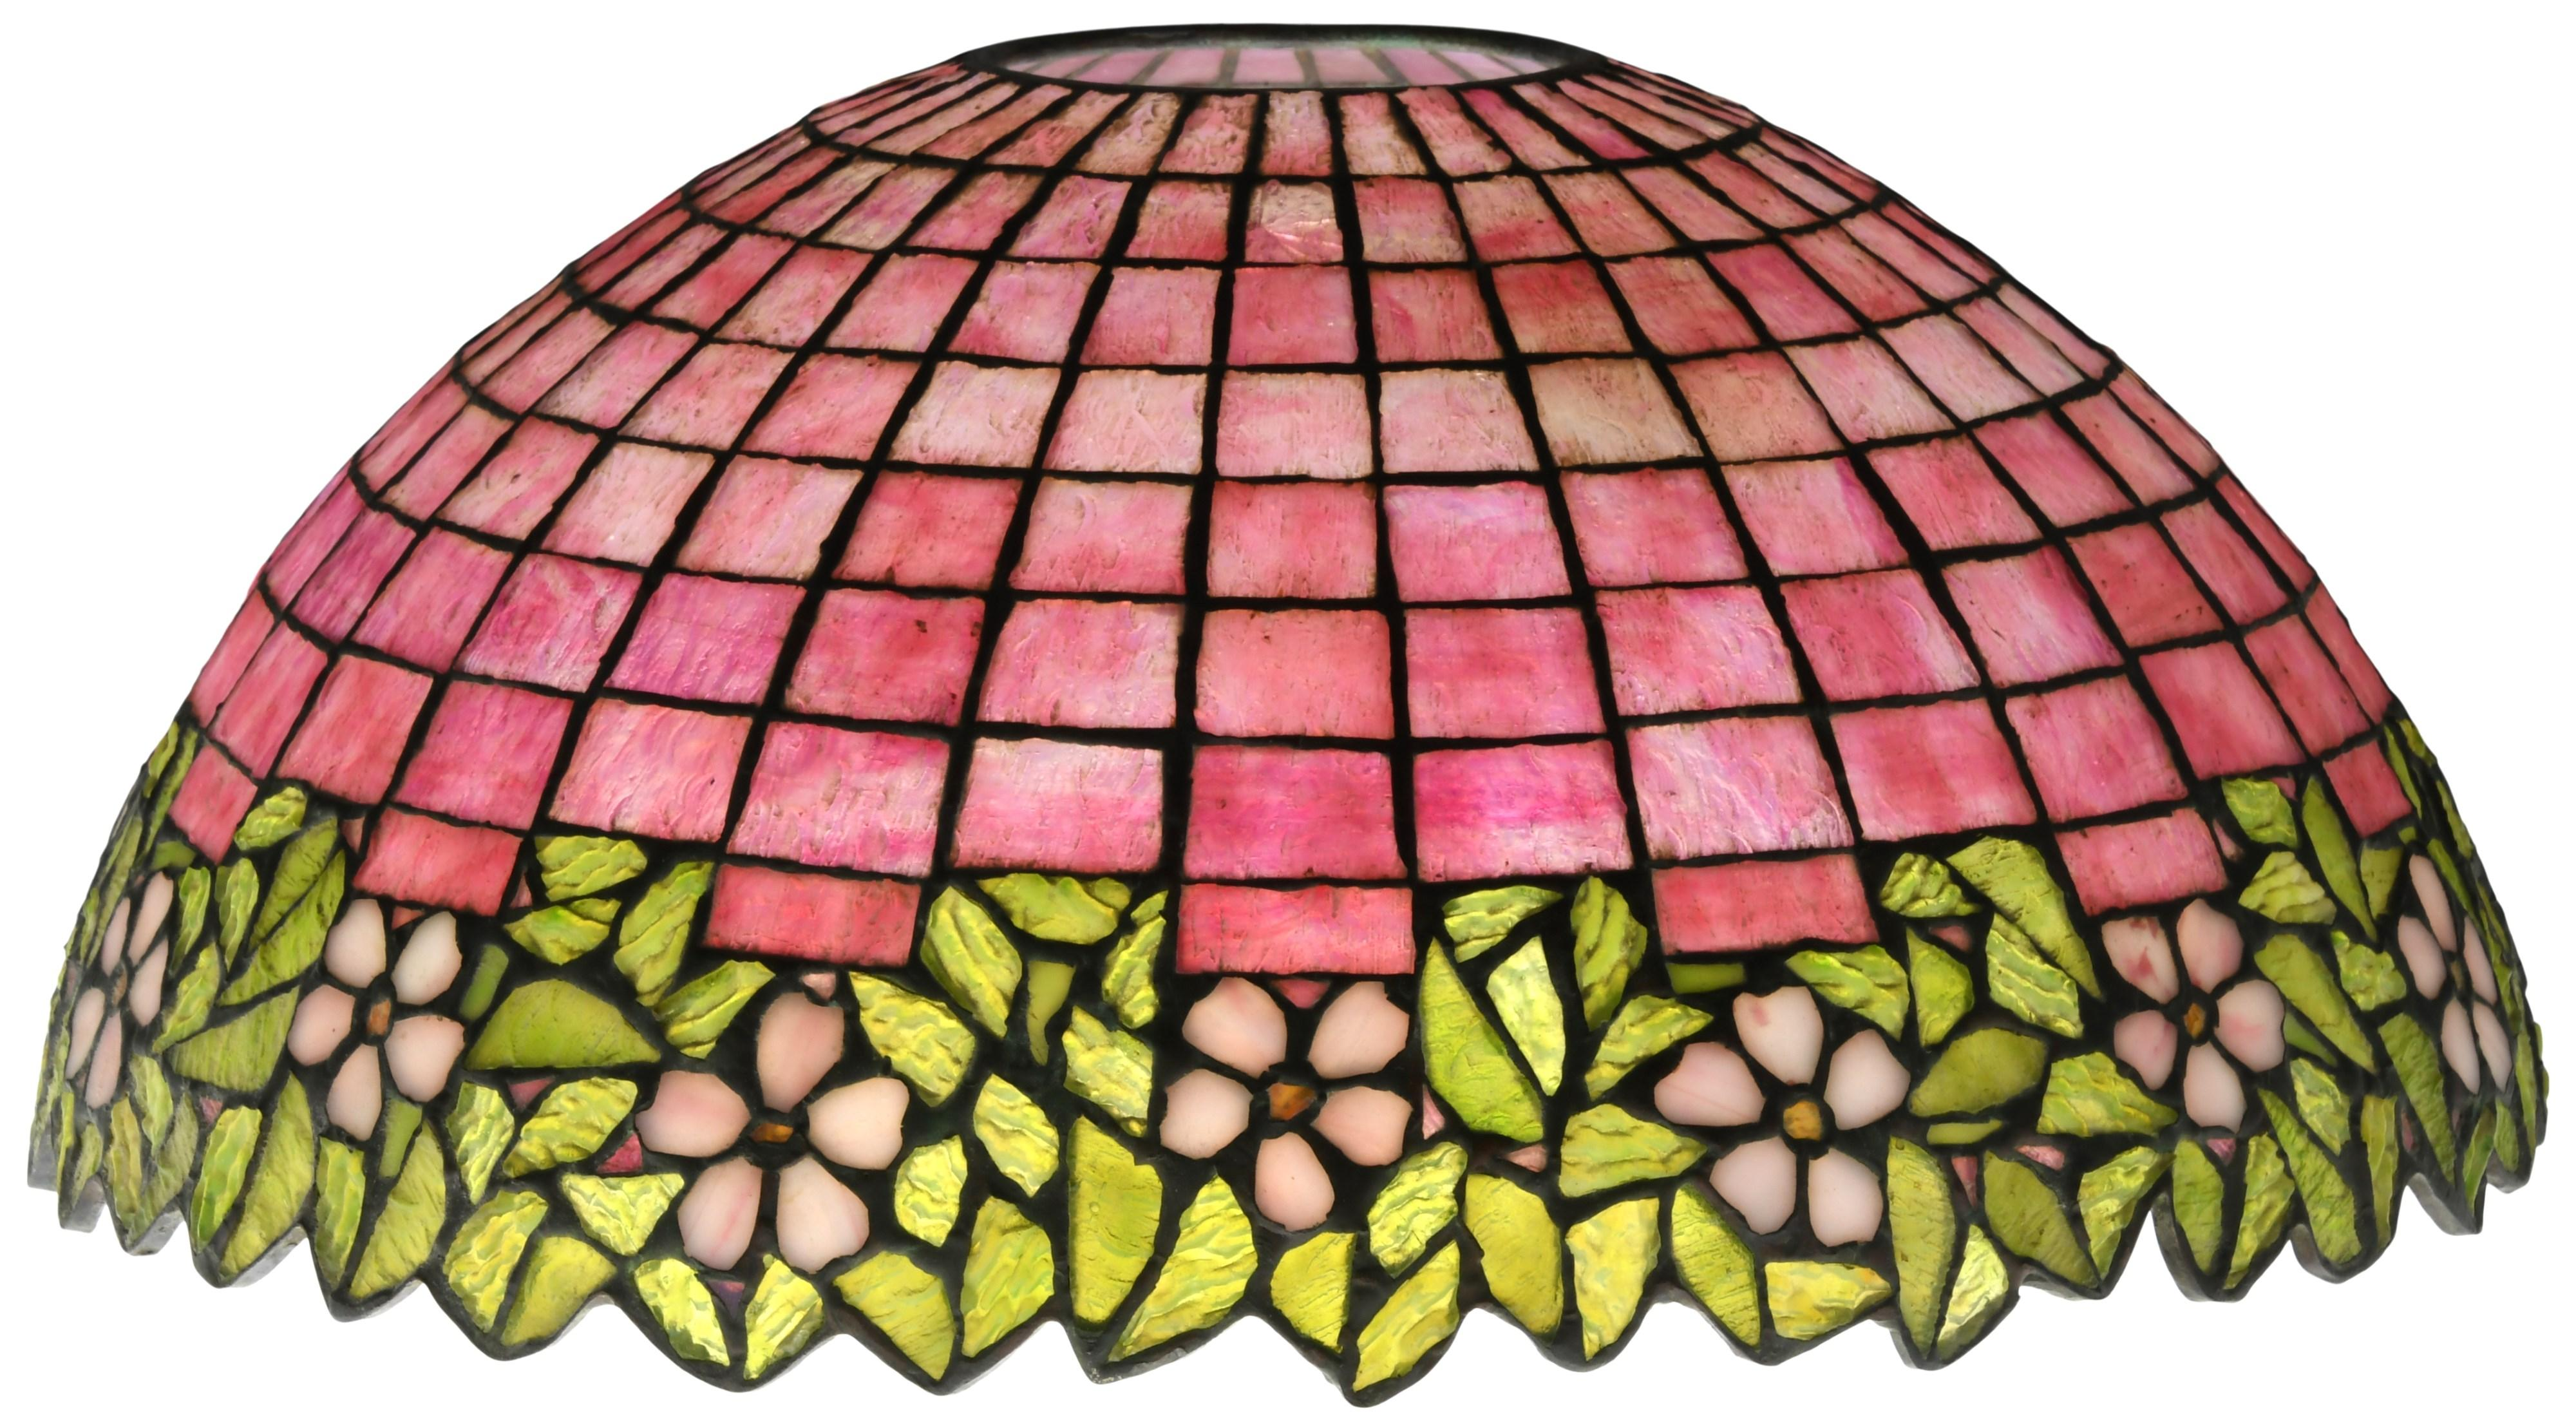 Unique Art Glass & Metal Co. Floral Lamp Shade